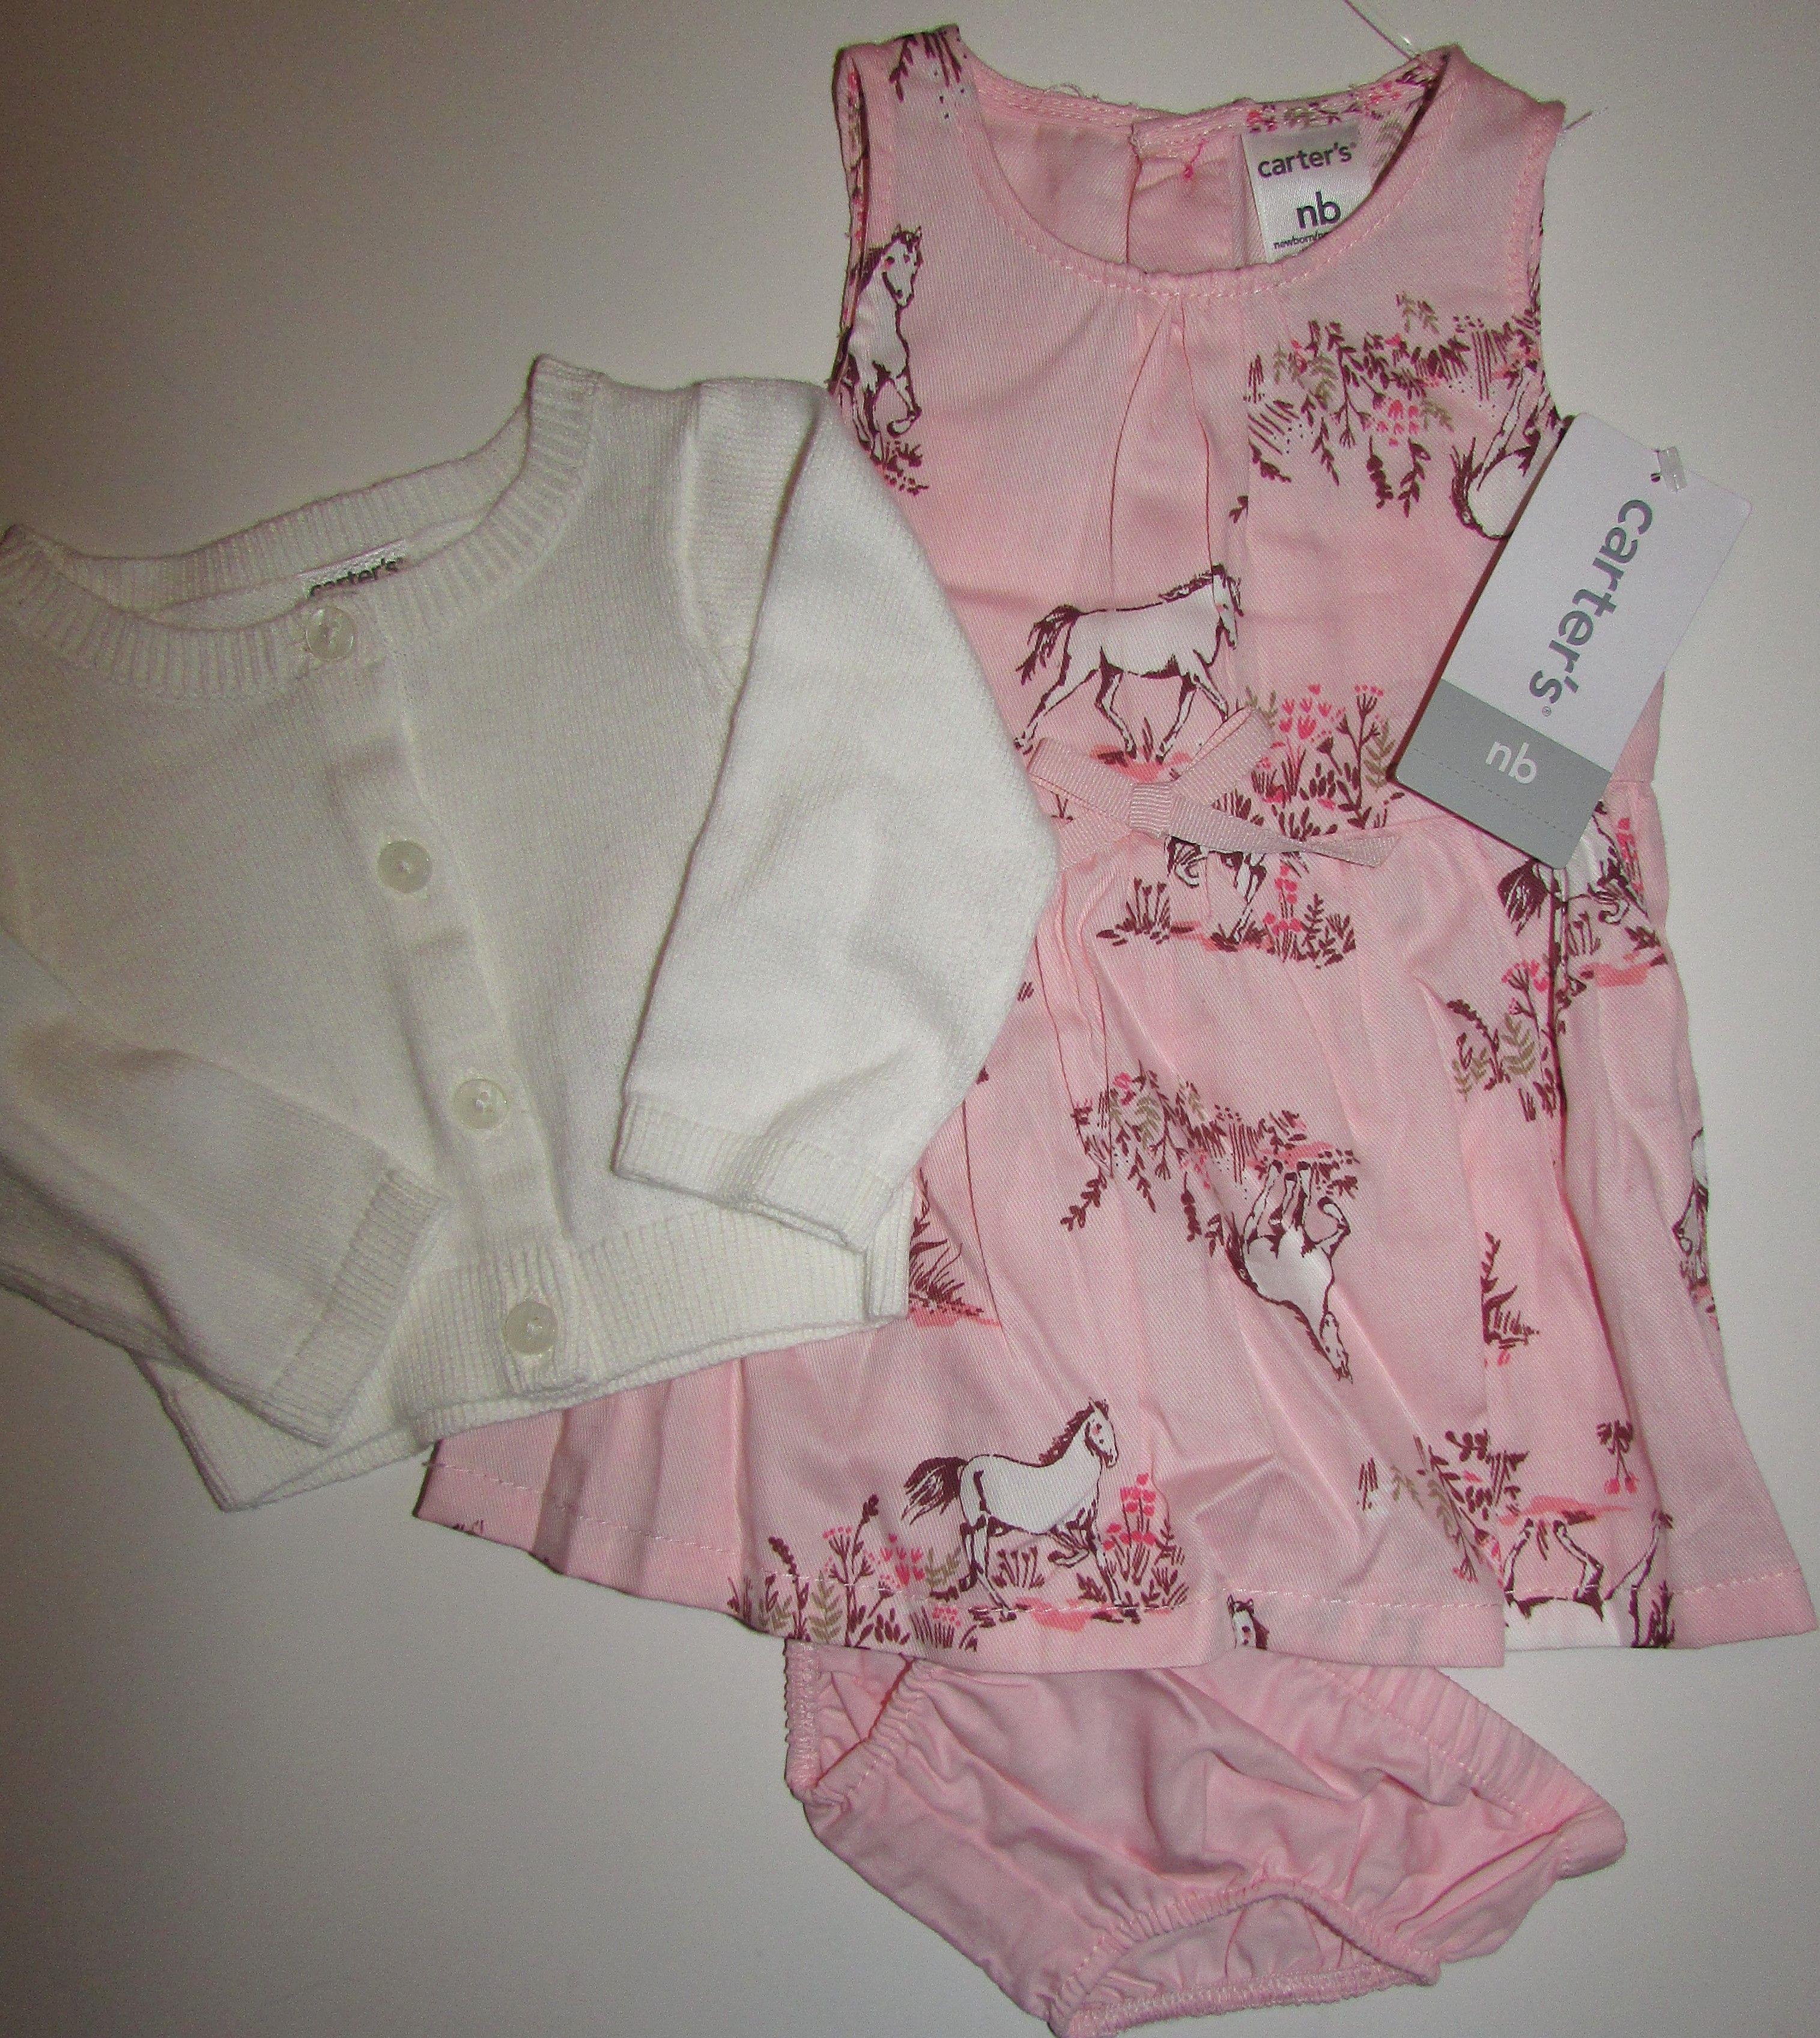 Carters 3 pc dress set pink ponies size N